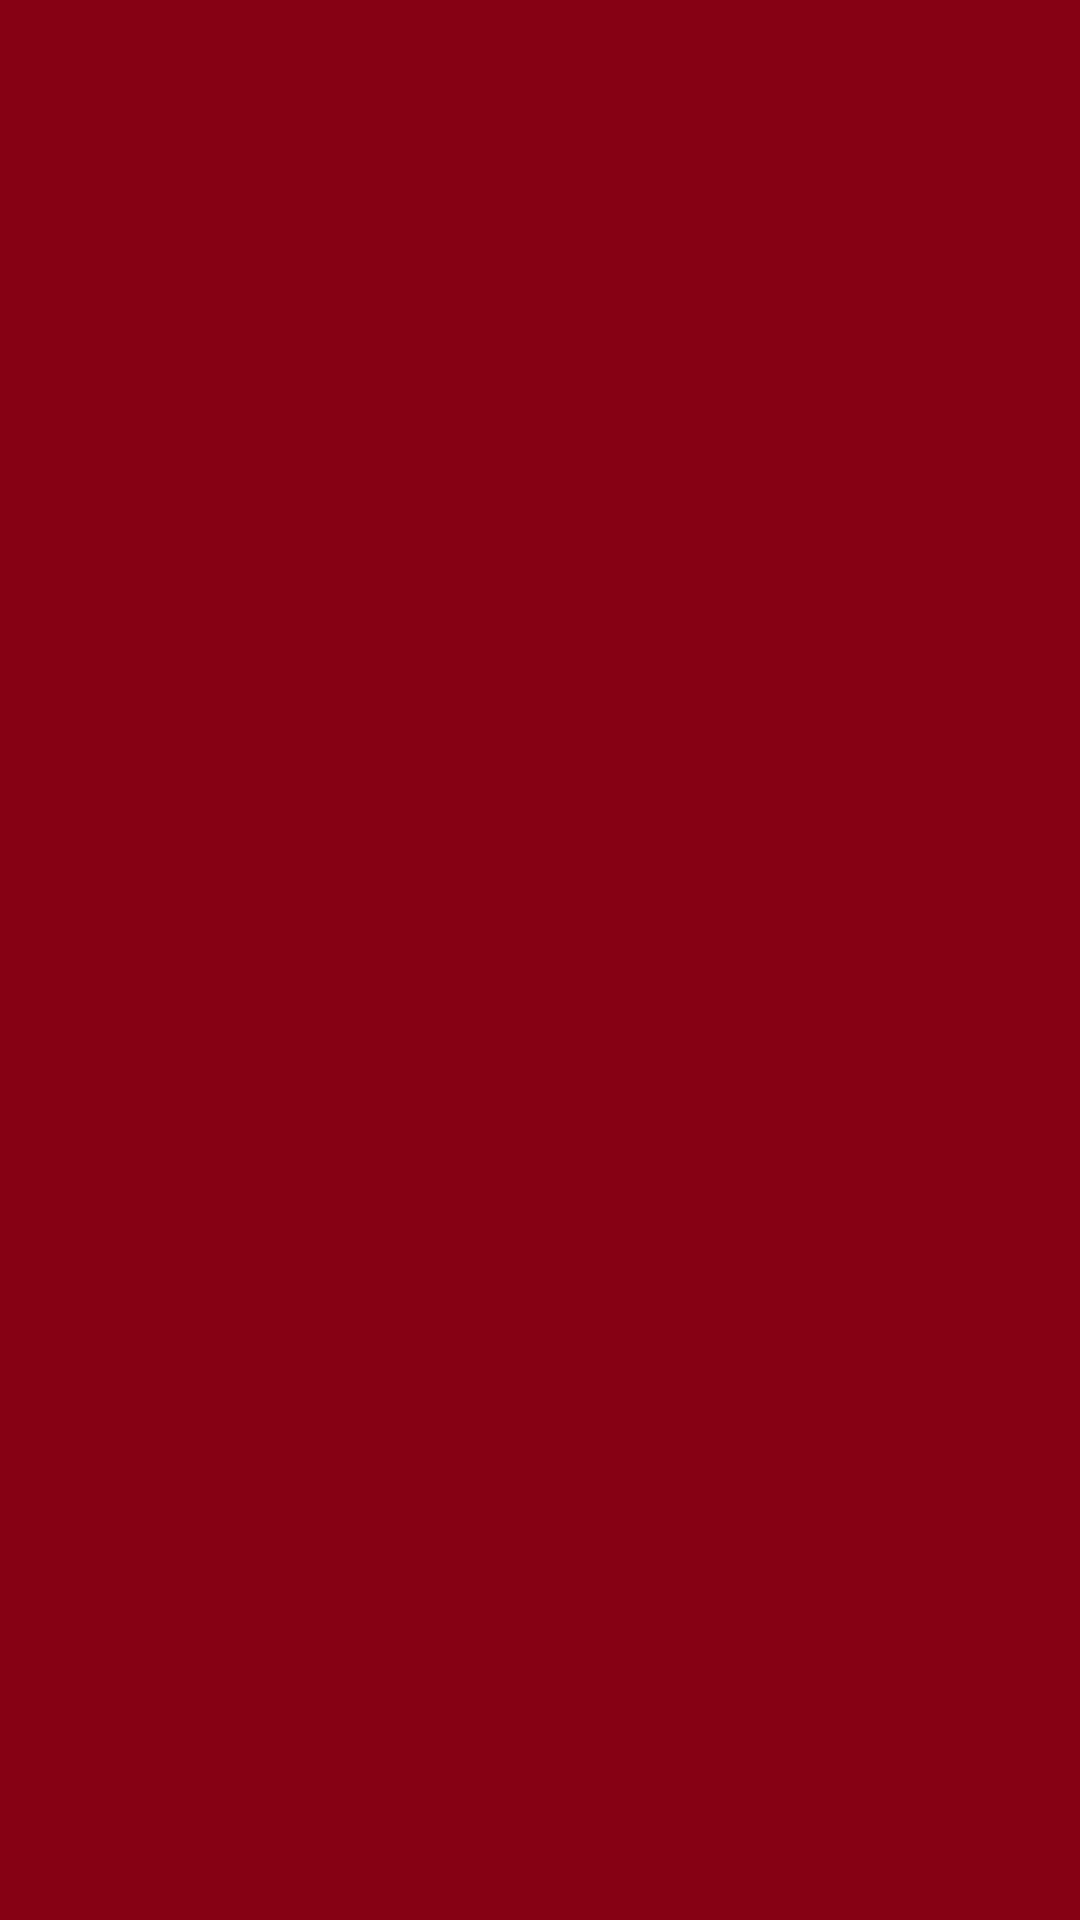 1080x1920 Red Devil Solid Color Background